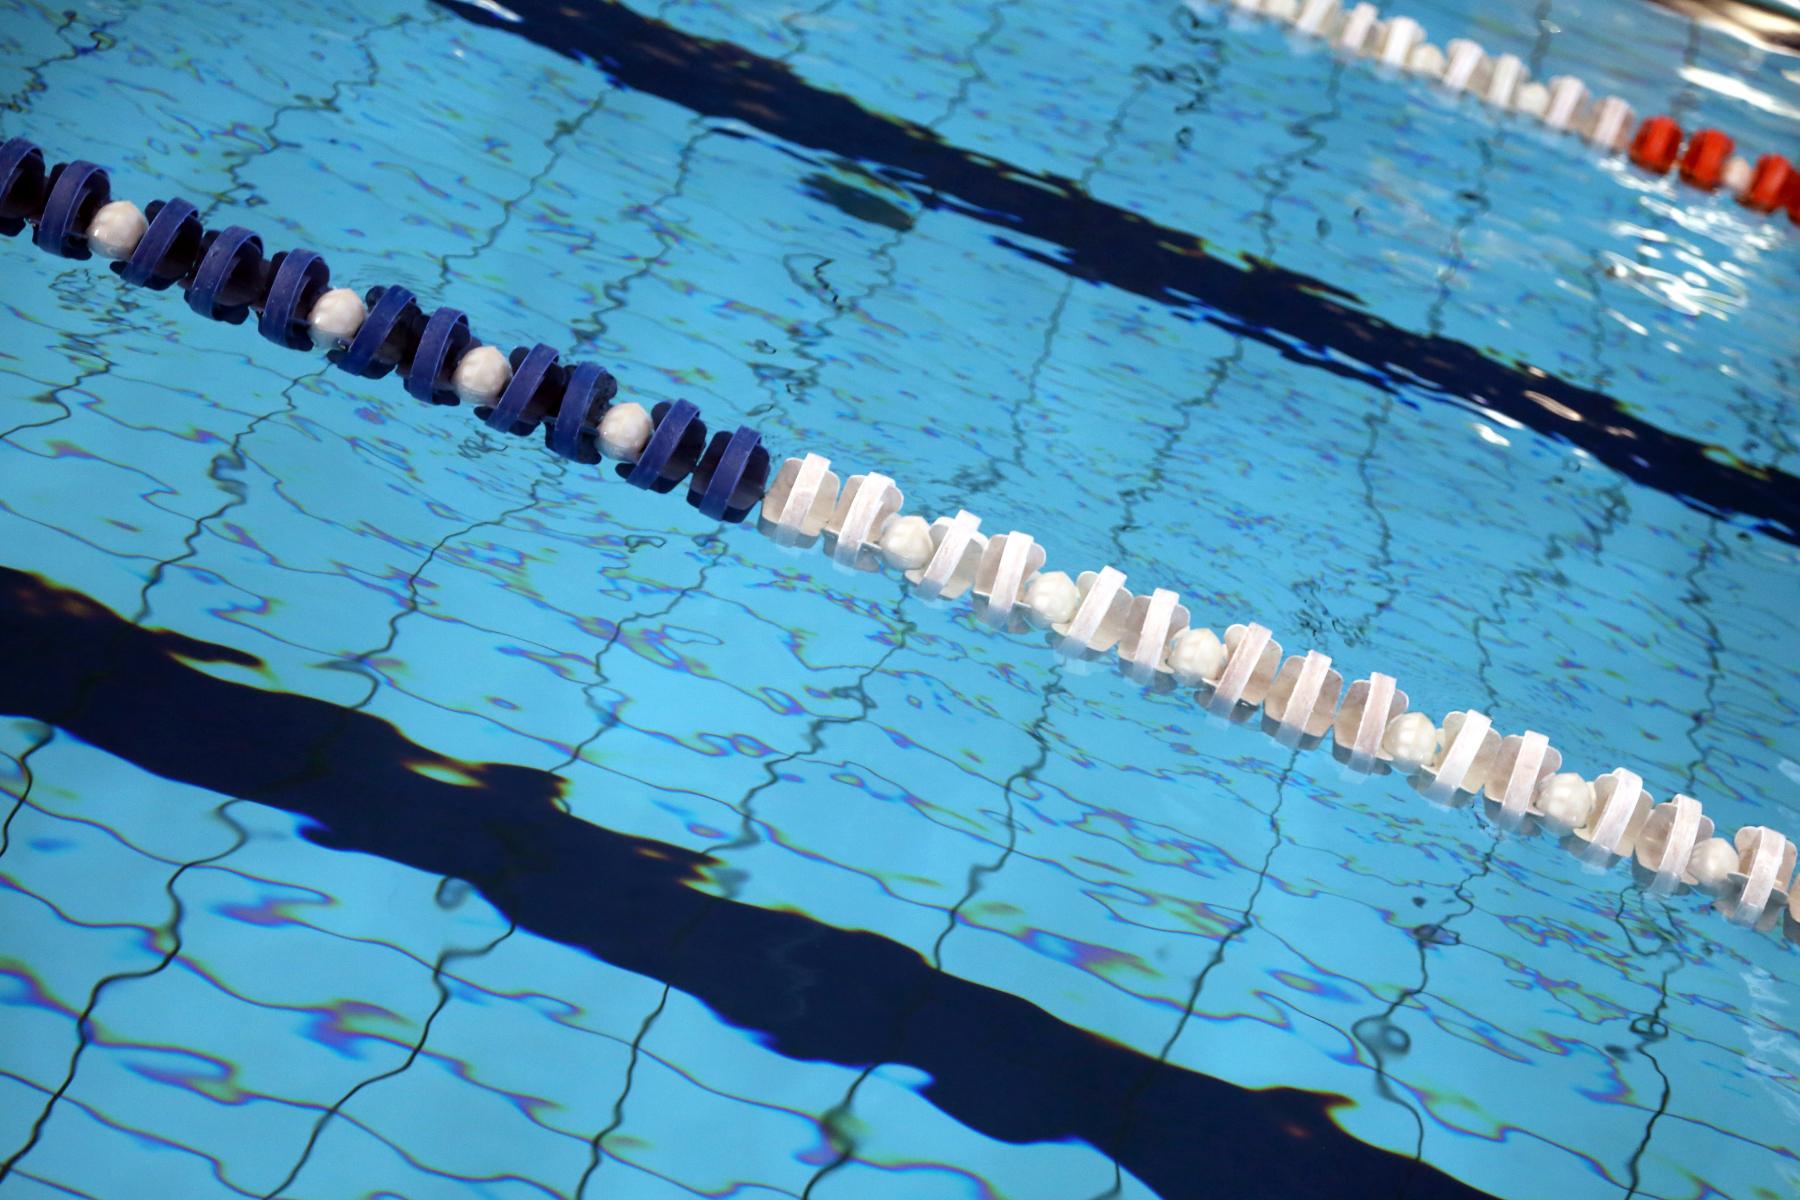 Skillelinje i badebasseng